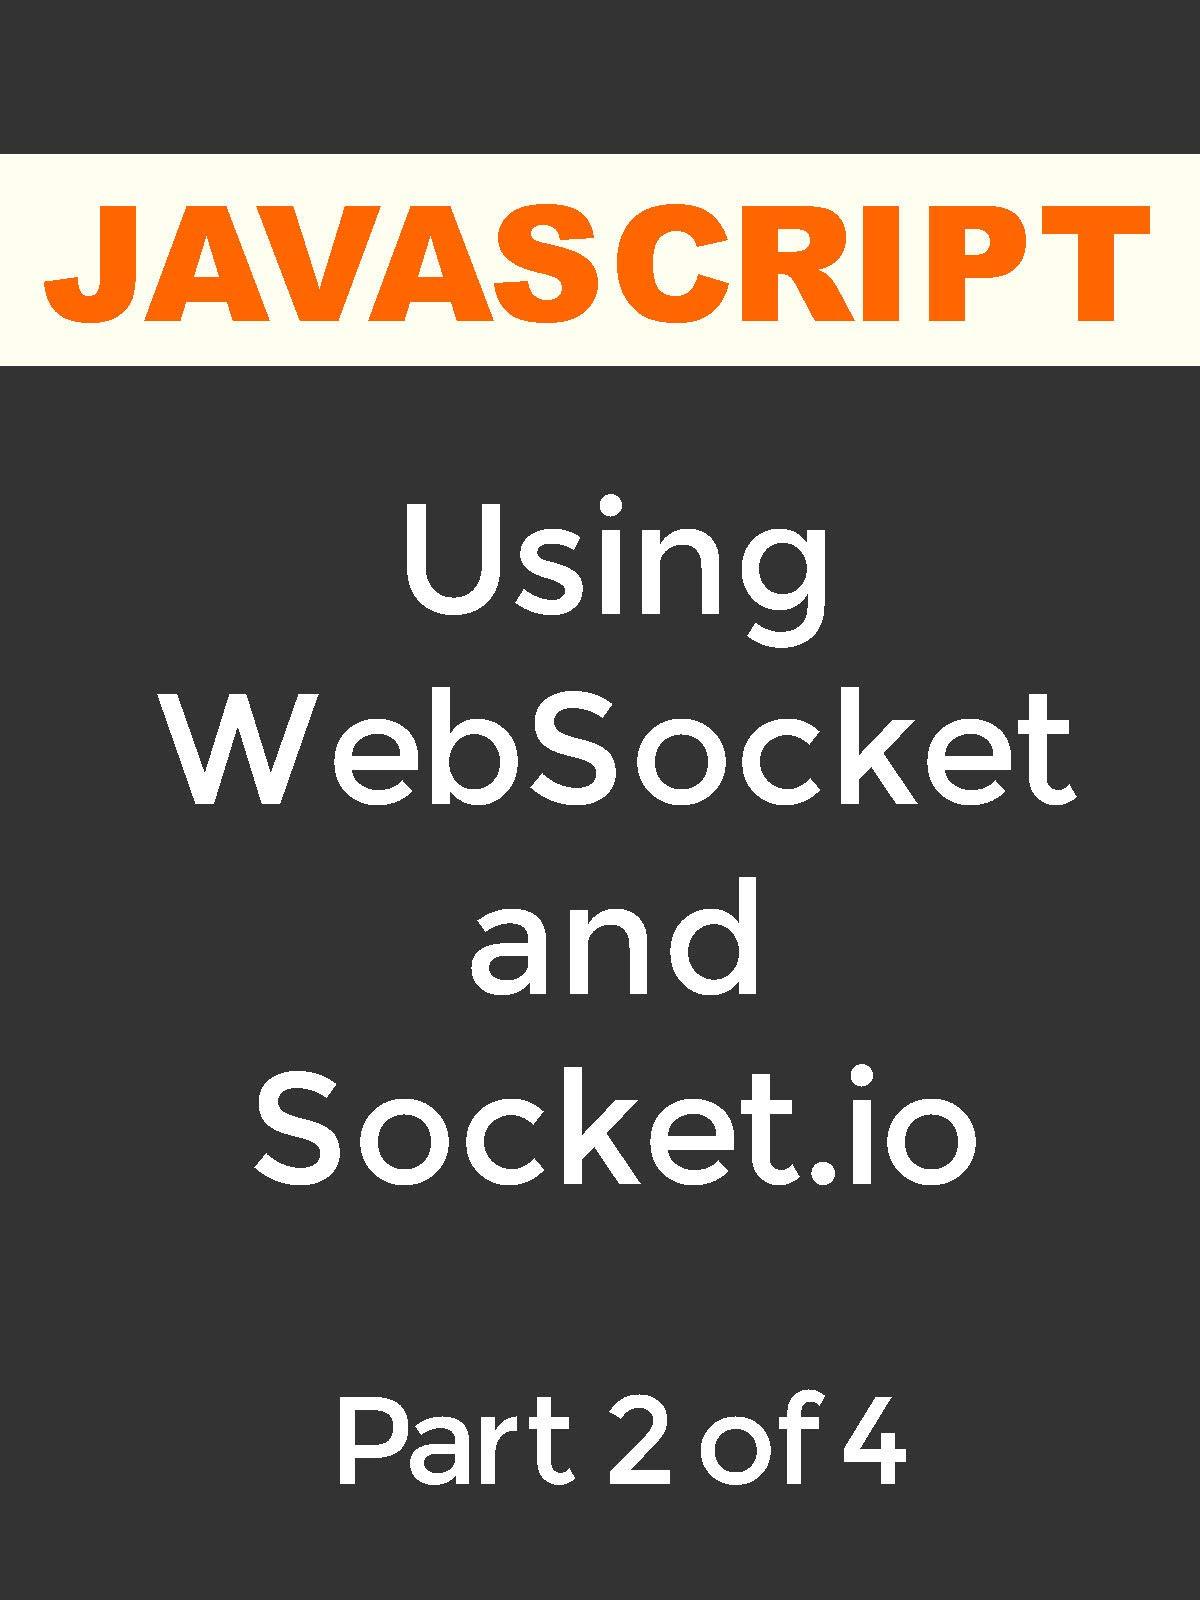 Web Socket, Part 2 of 4